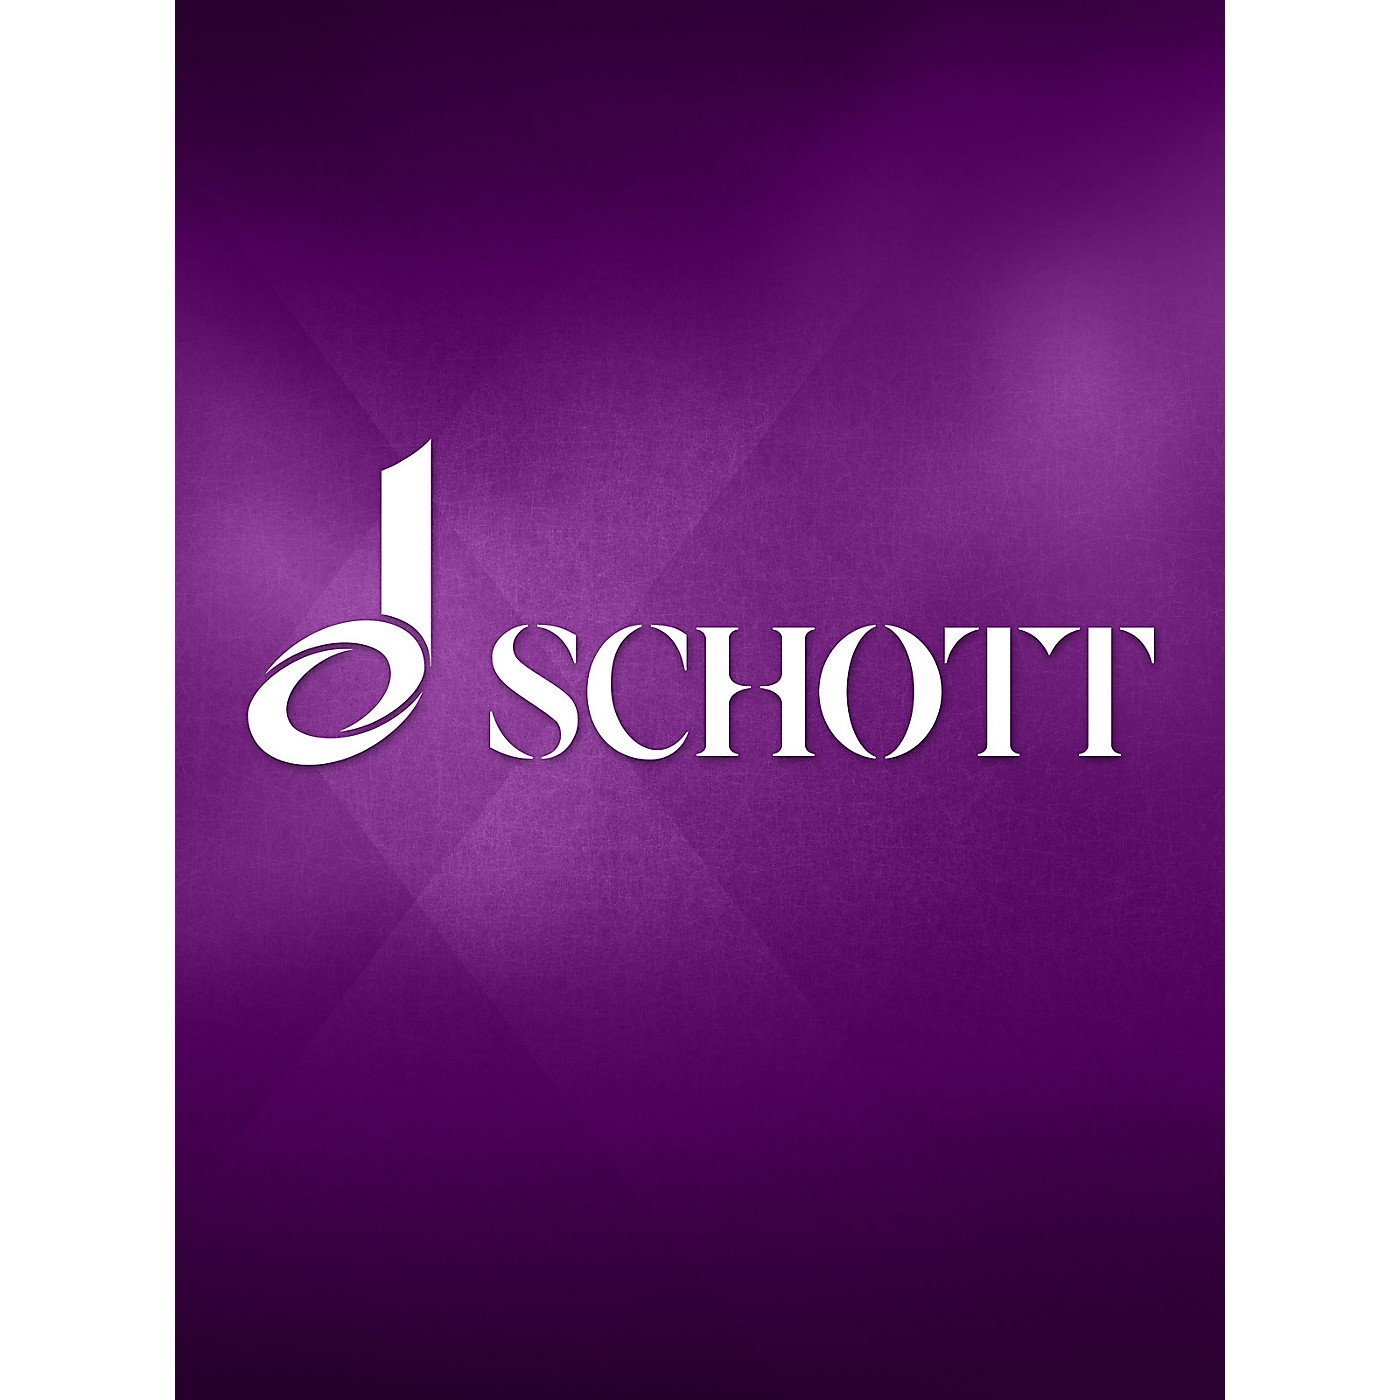 Schott 5 Translucent Landscapes (for Piano) Schott Series thumbnail